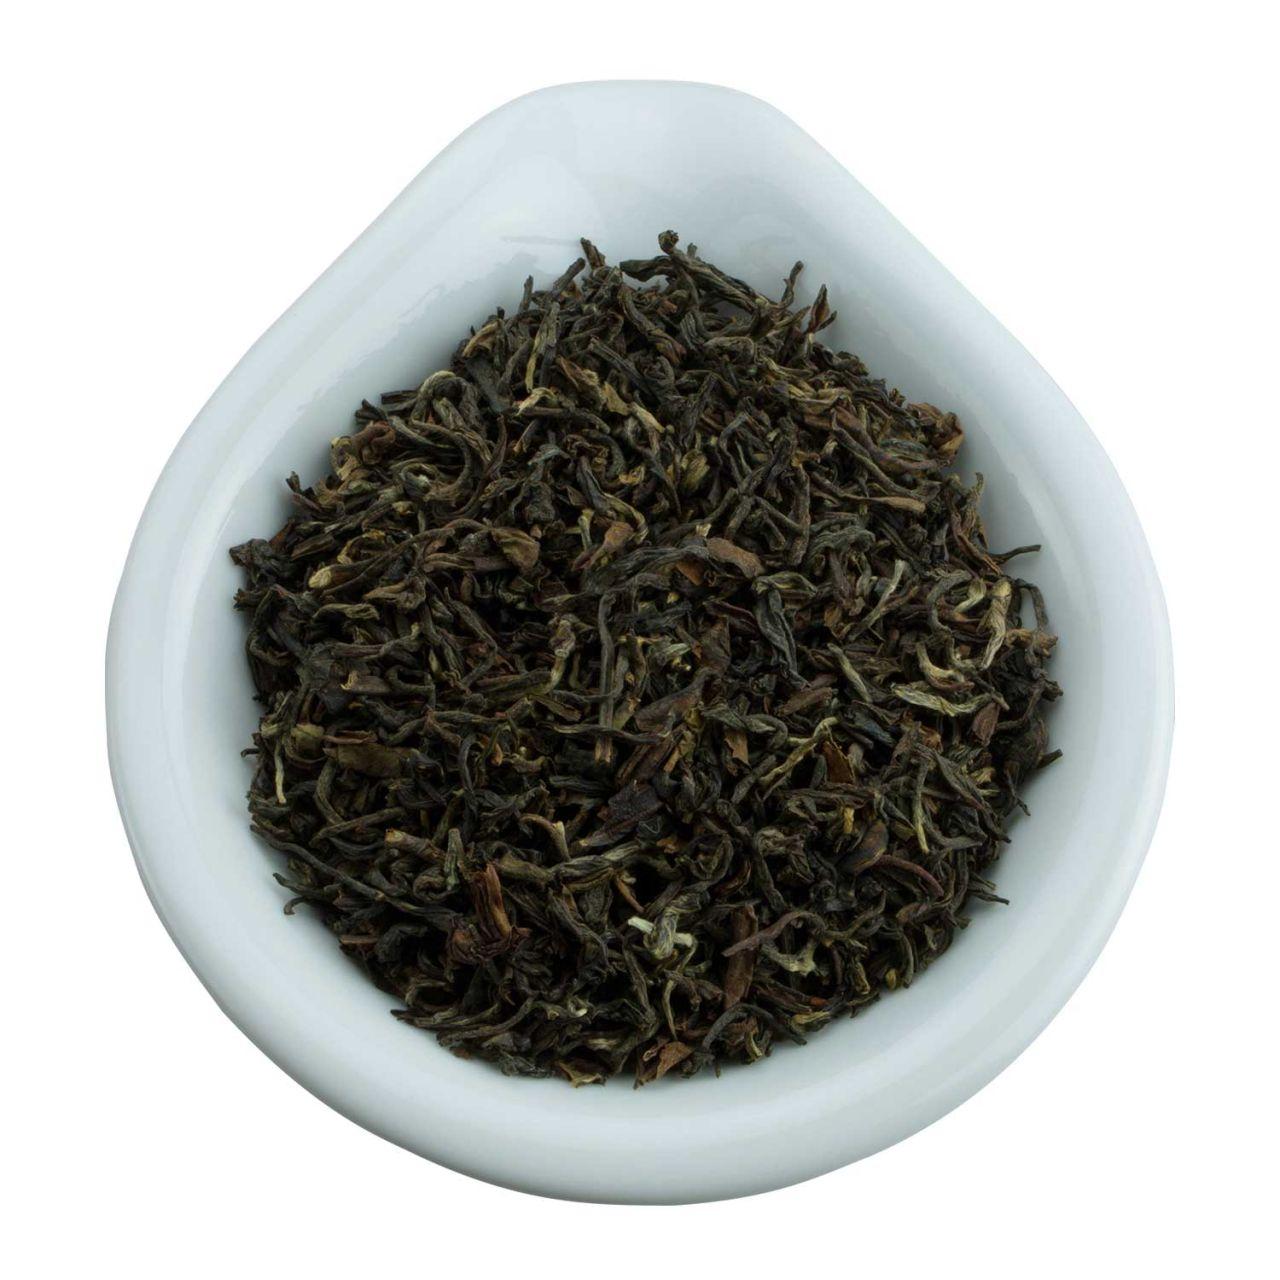 schwarzer Tee (Nepal)